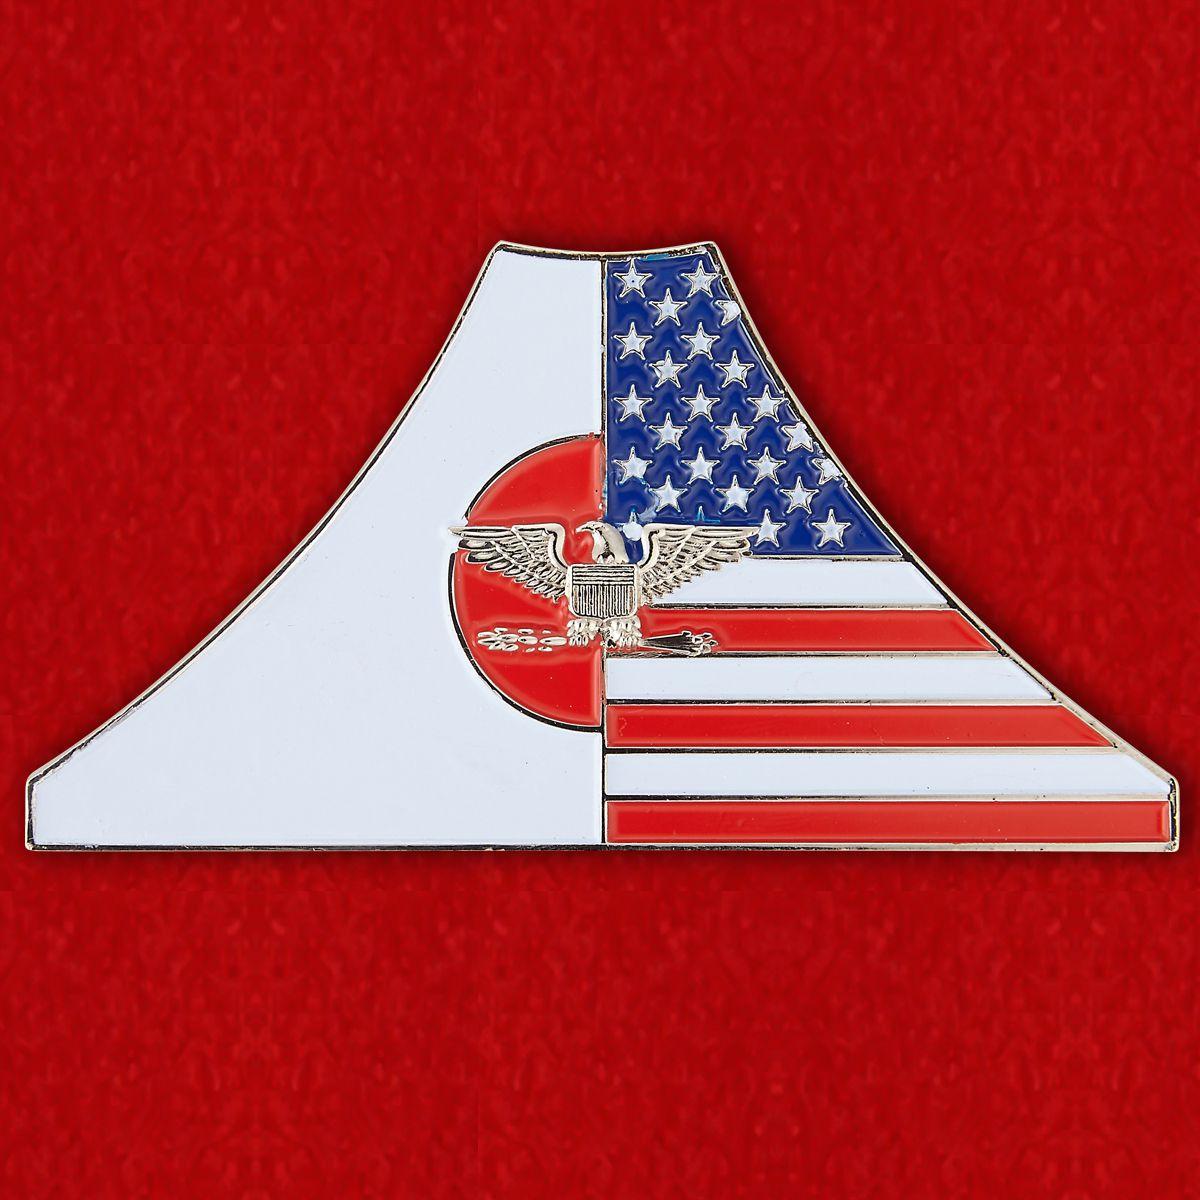 J3 US Forces Jahan Challenge Coin